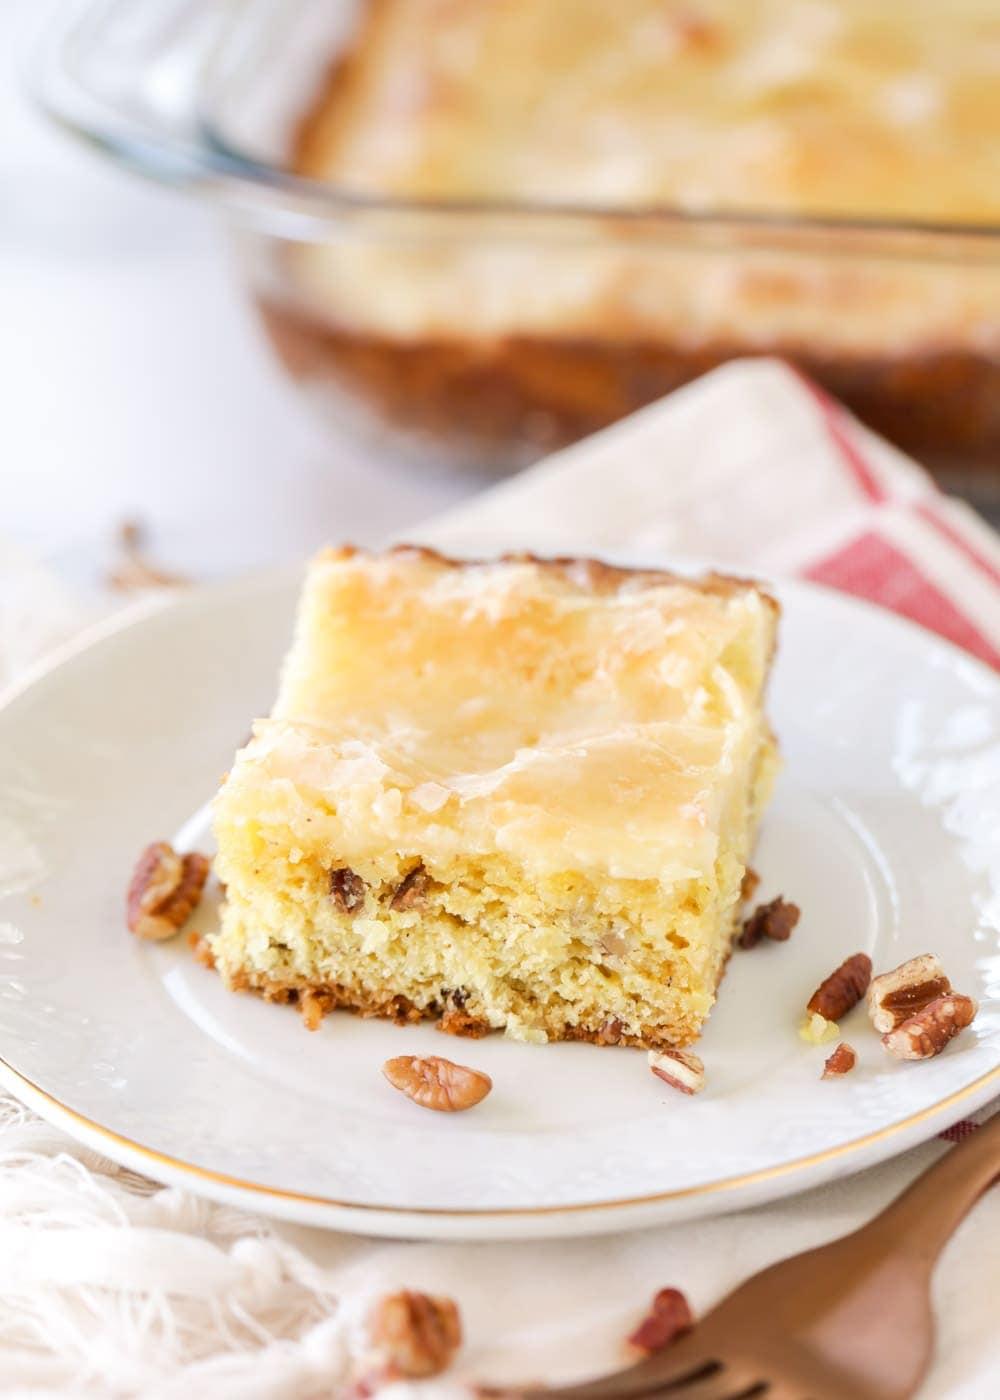 Neiman Marcus Cake recipe on a white plate